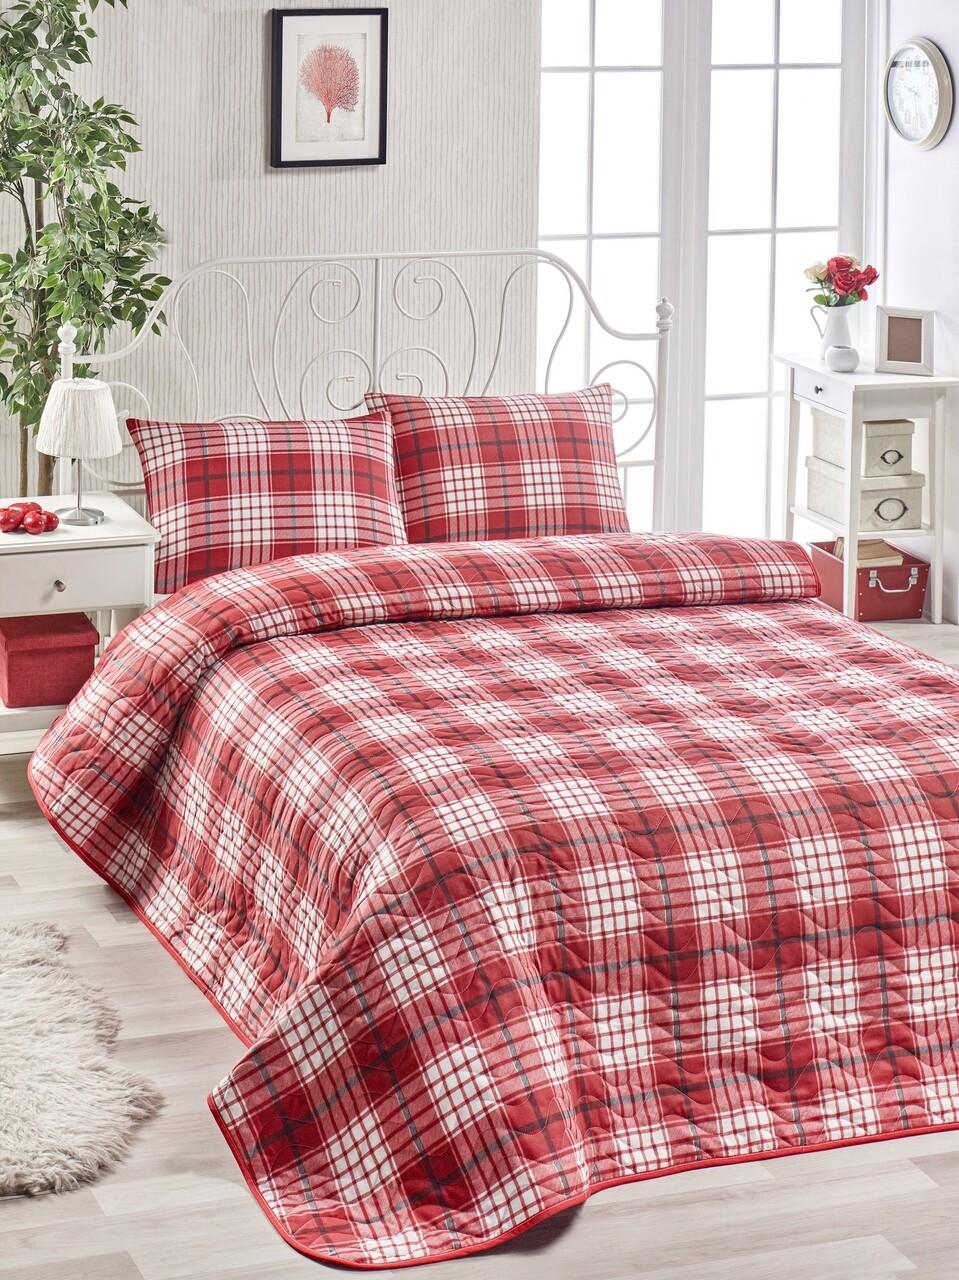 Set cuvertura de pat, EnLora Home, Burberry, 3 piese, Multicolor